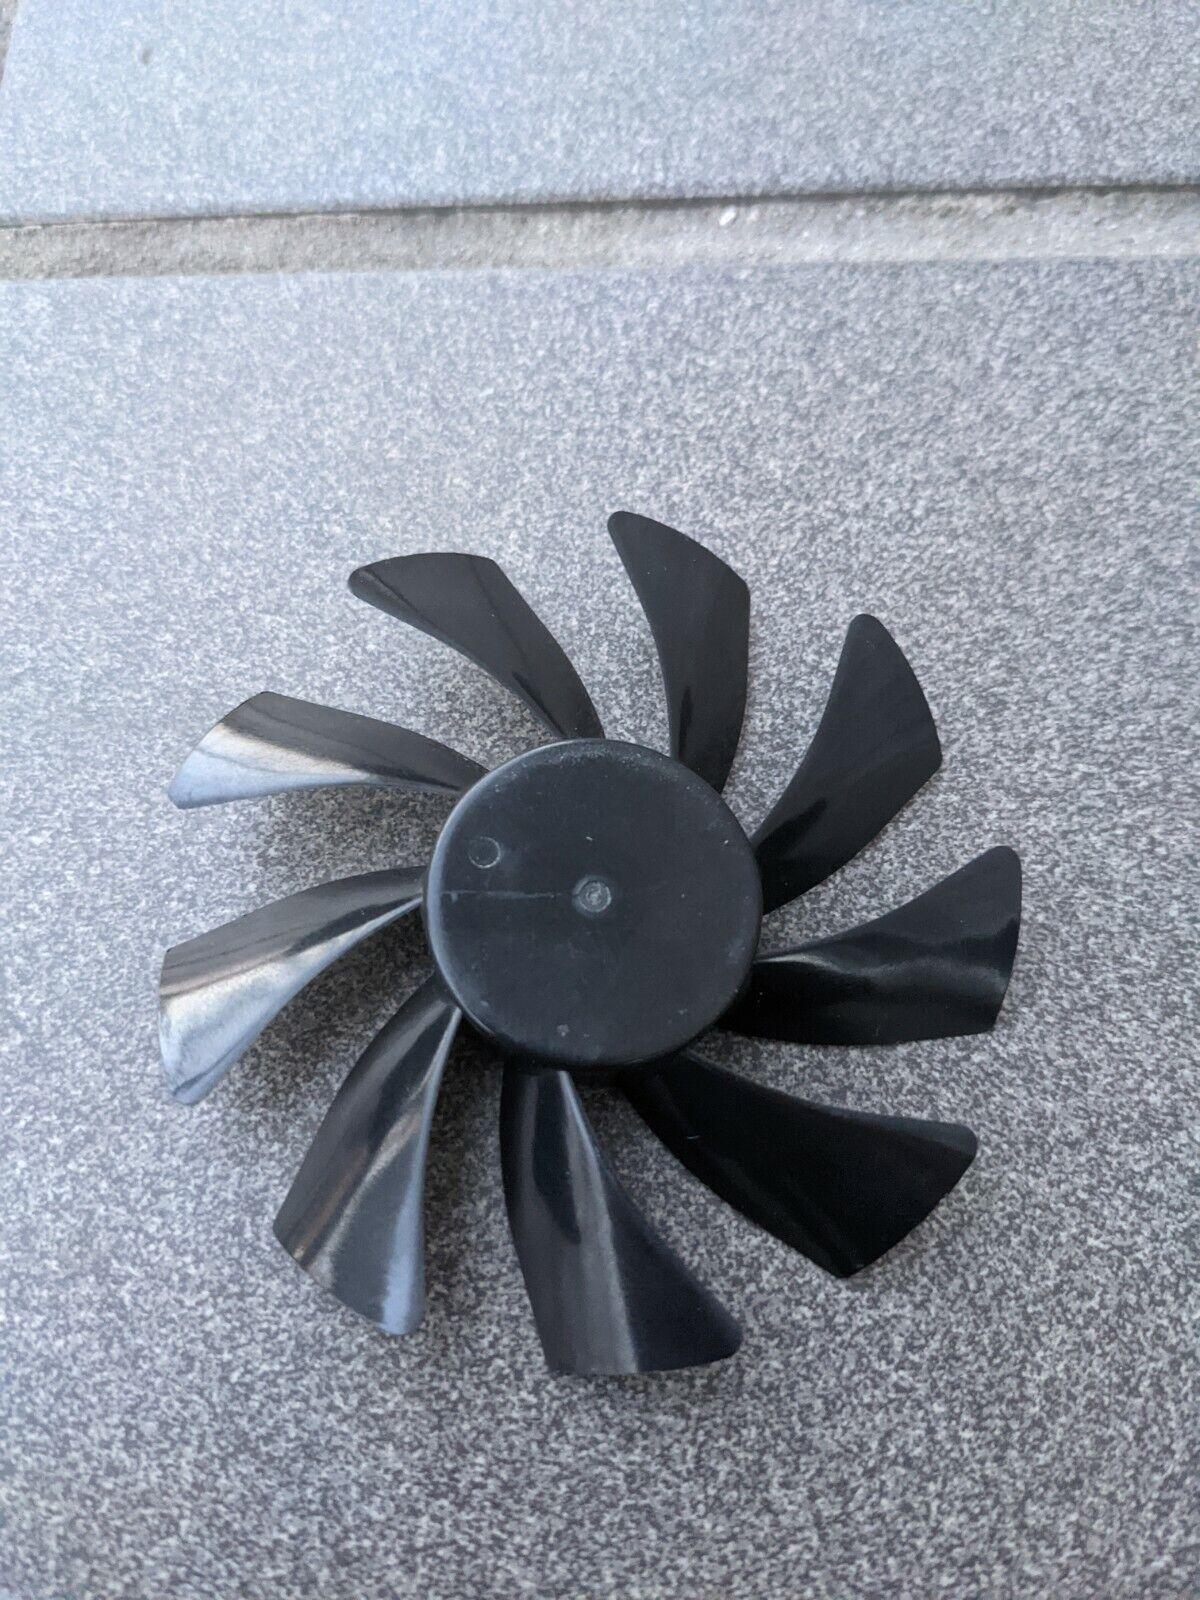 *NO MOTOR* Fan Blade Only XFX HD7950 HD 7970 7950 Dual-X 85MM